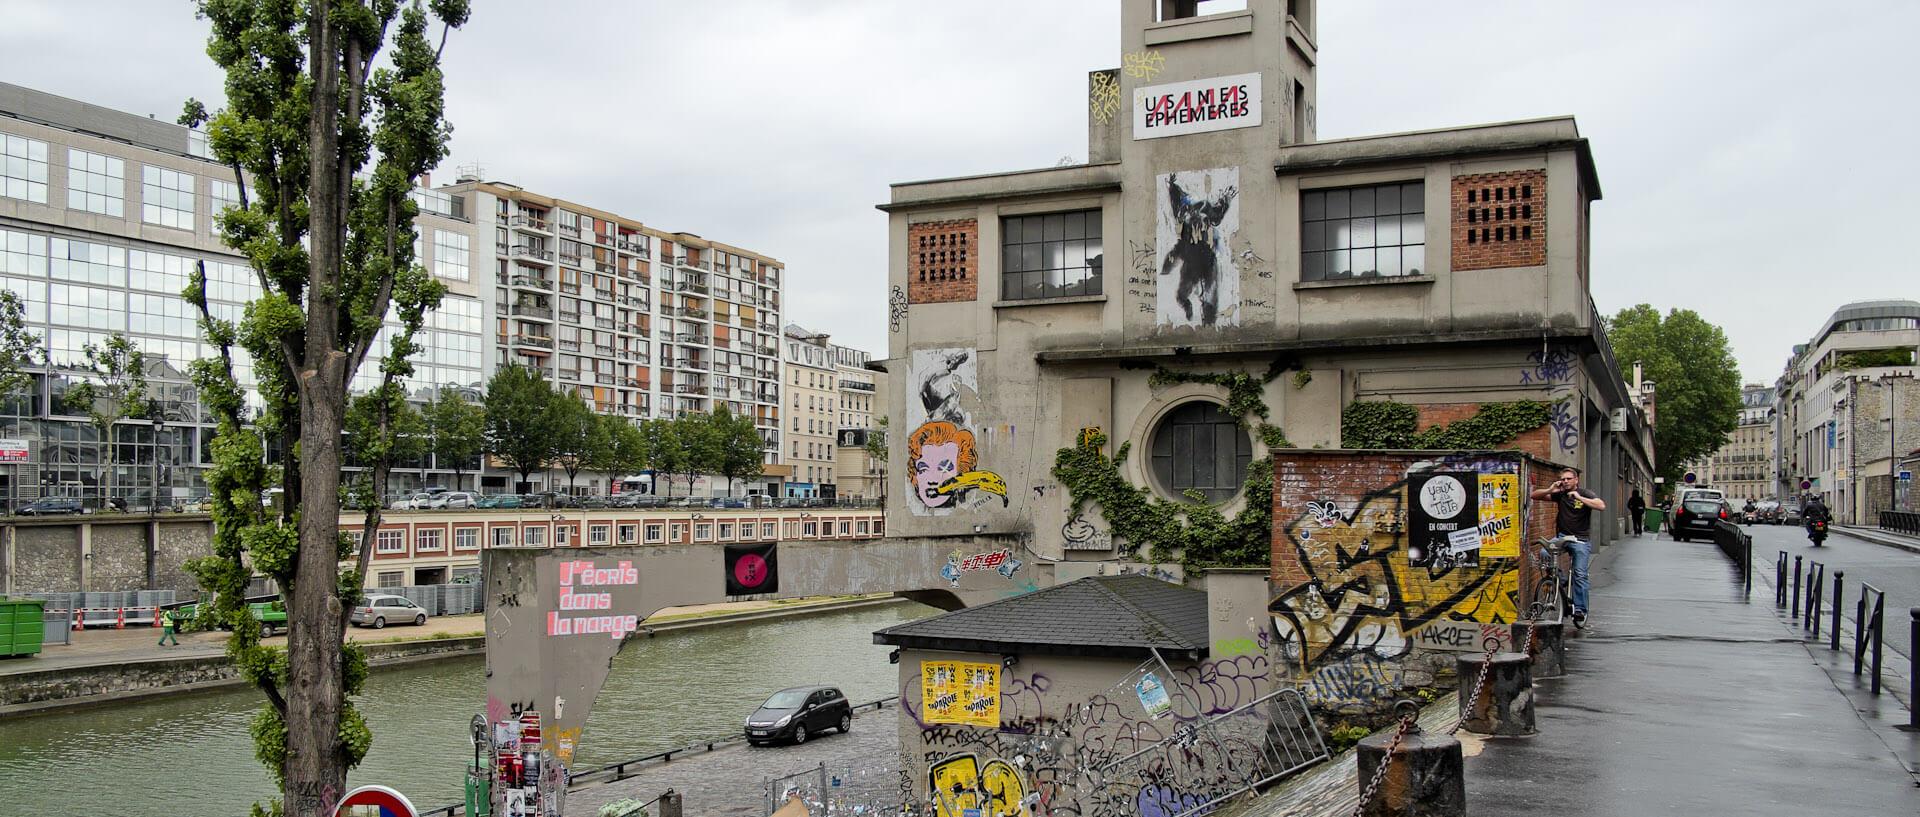 ou-voir-street-art-paris-quai-de-valmy2